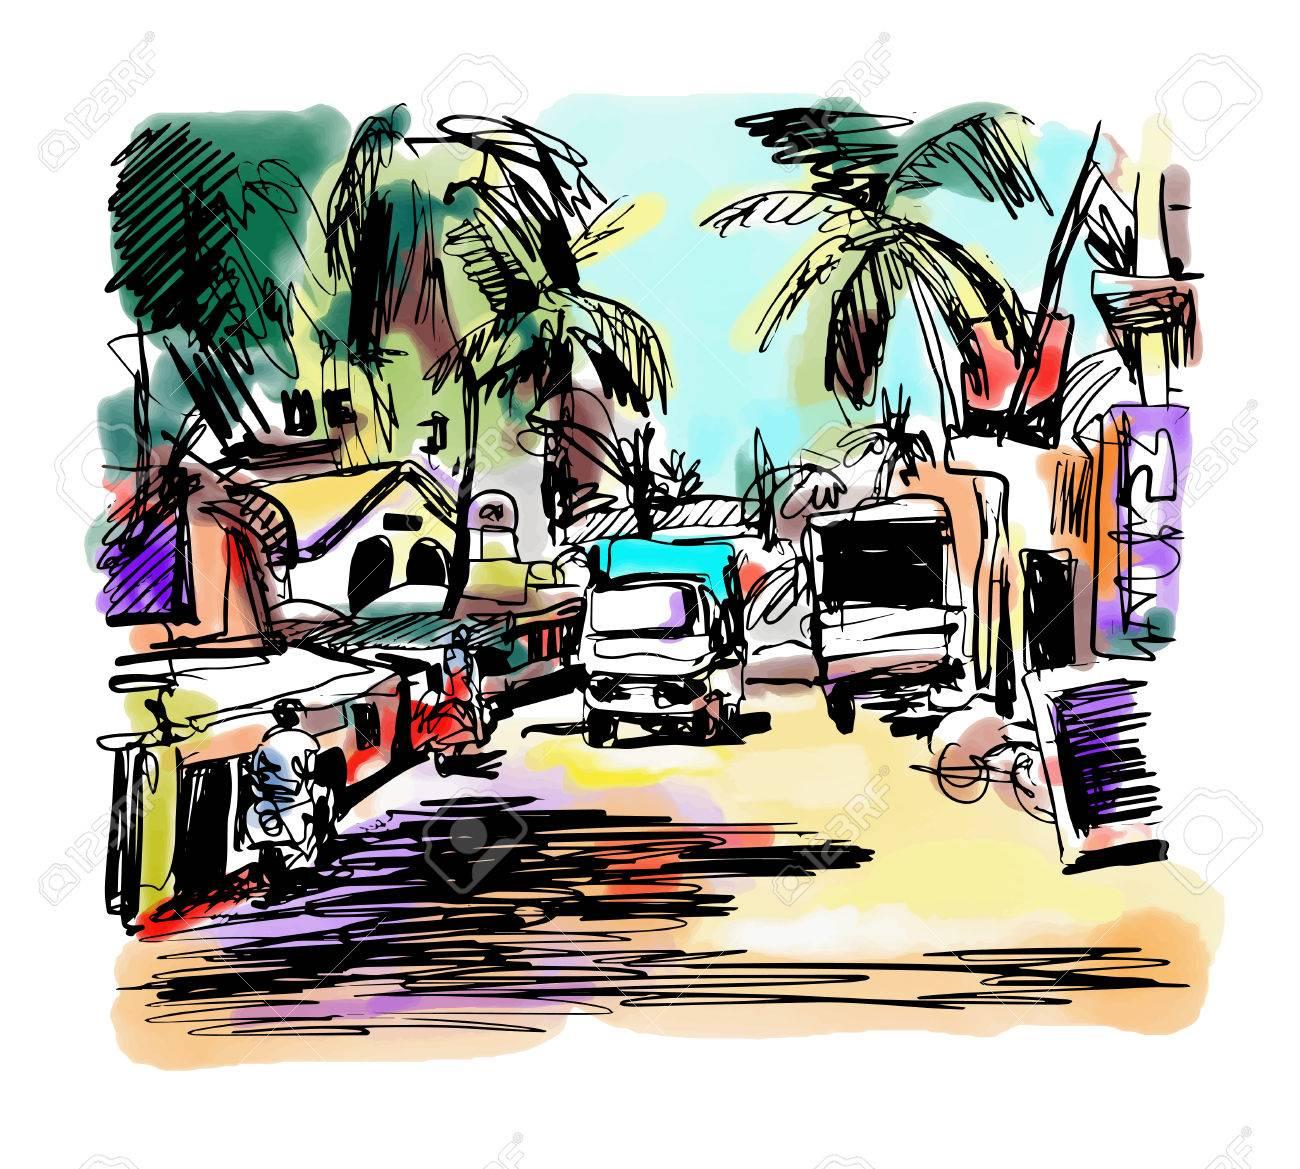 1300x1169 Original Digital Drawing Of India Goa Calangute Baga Landscape